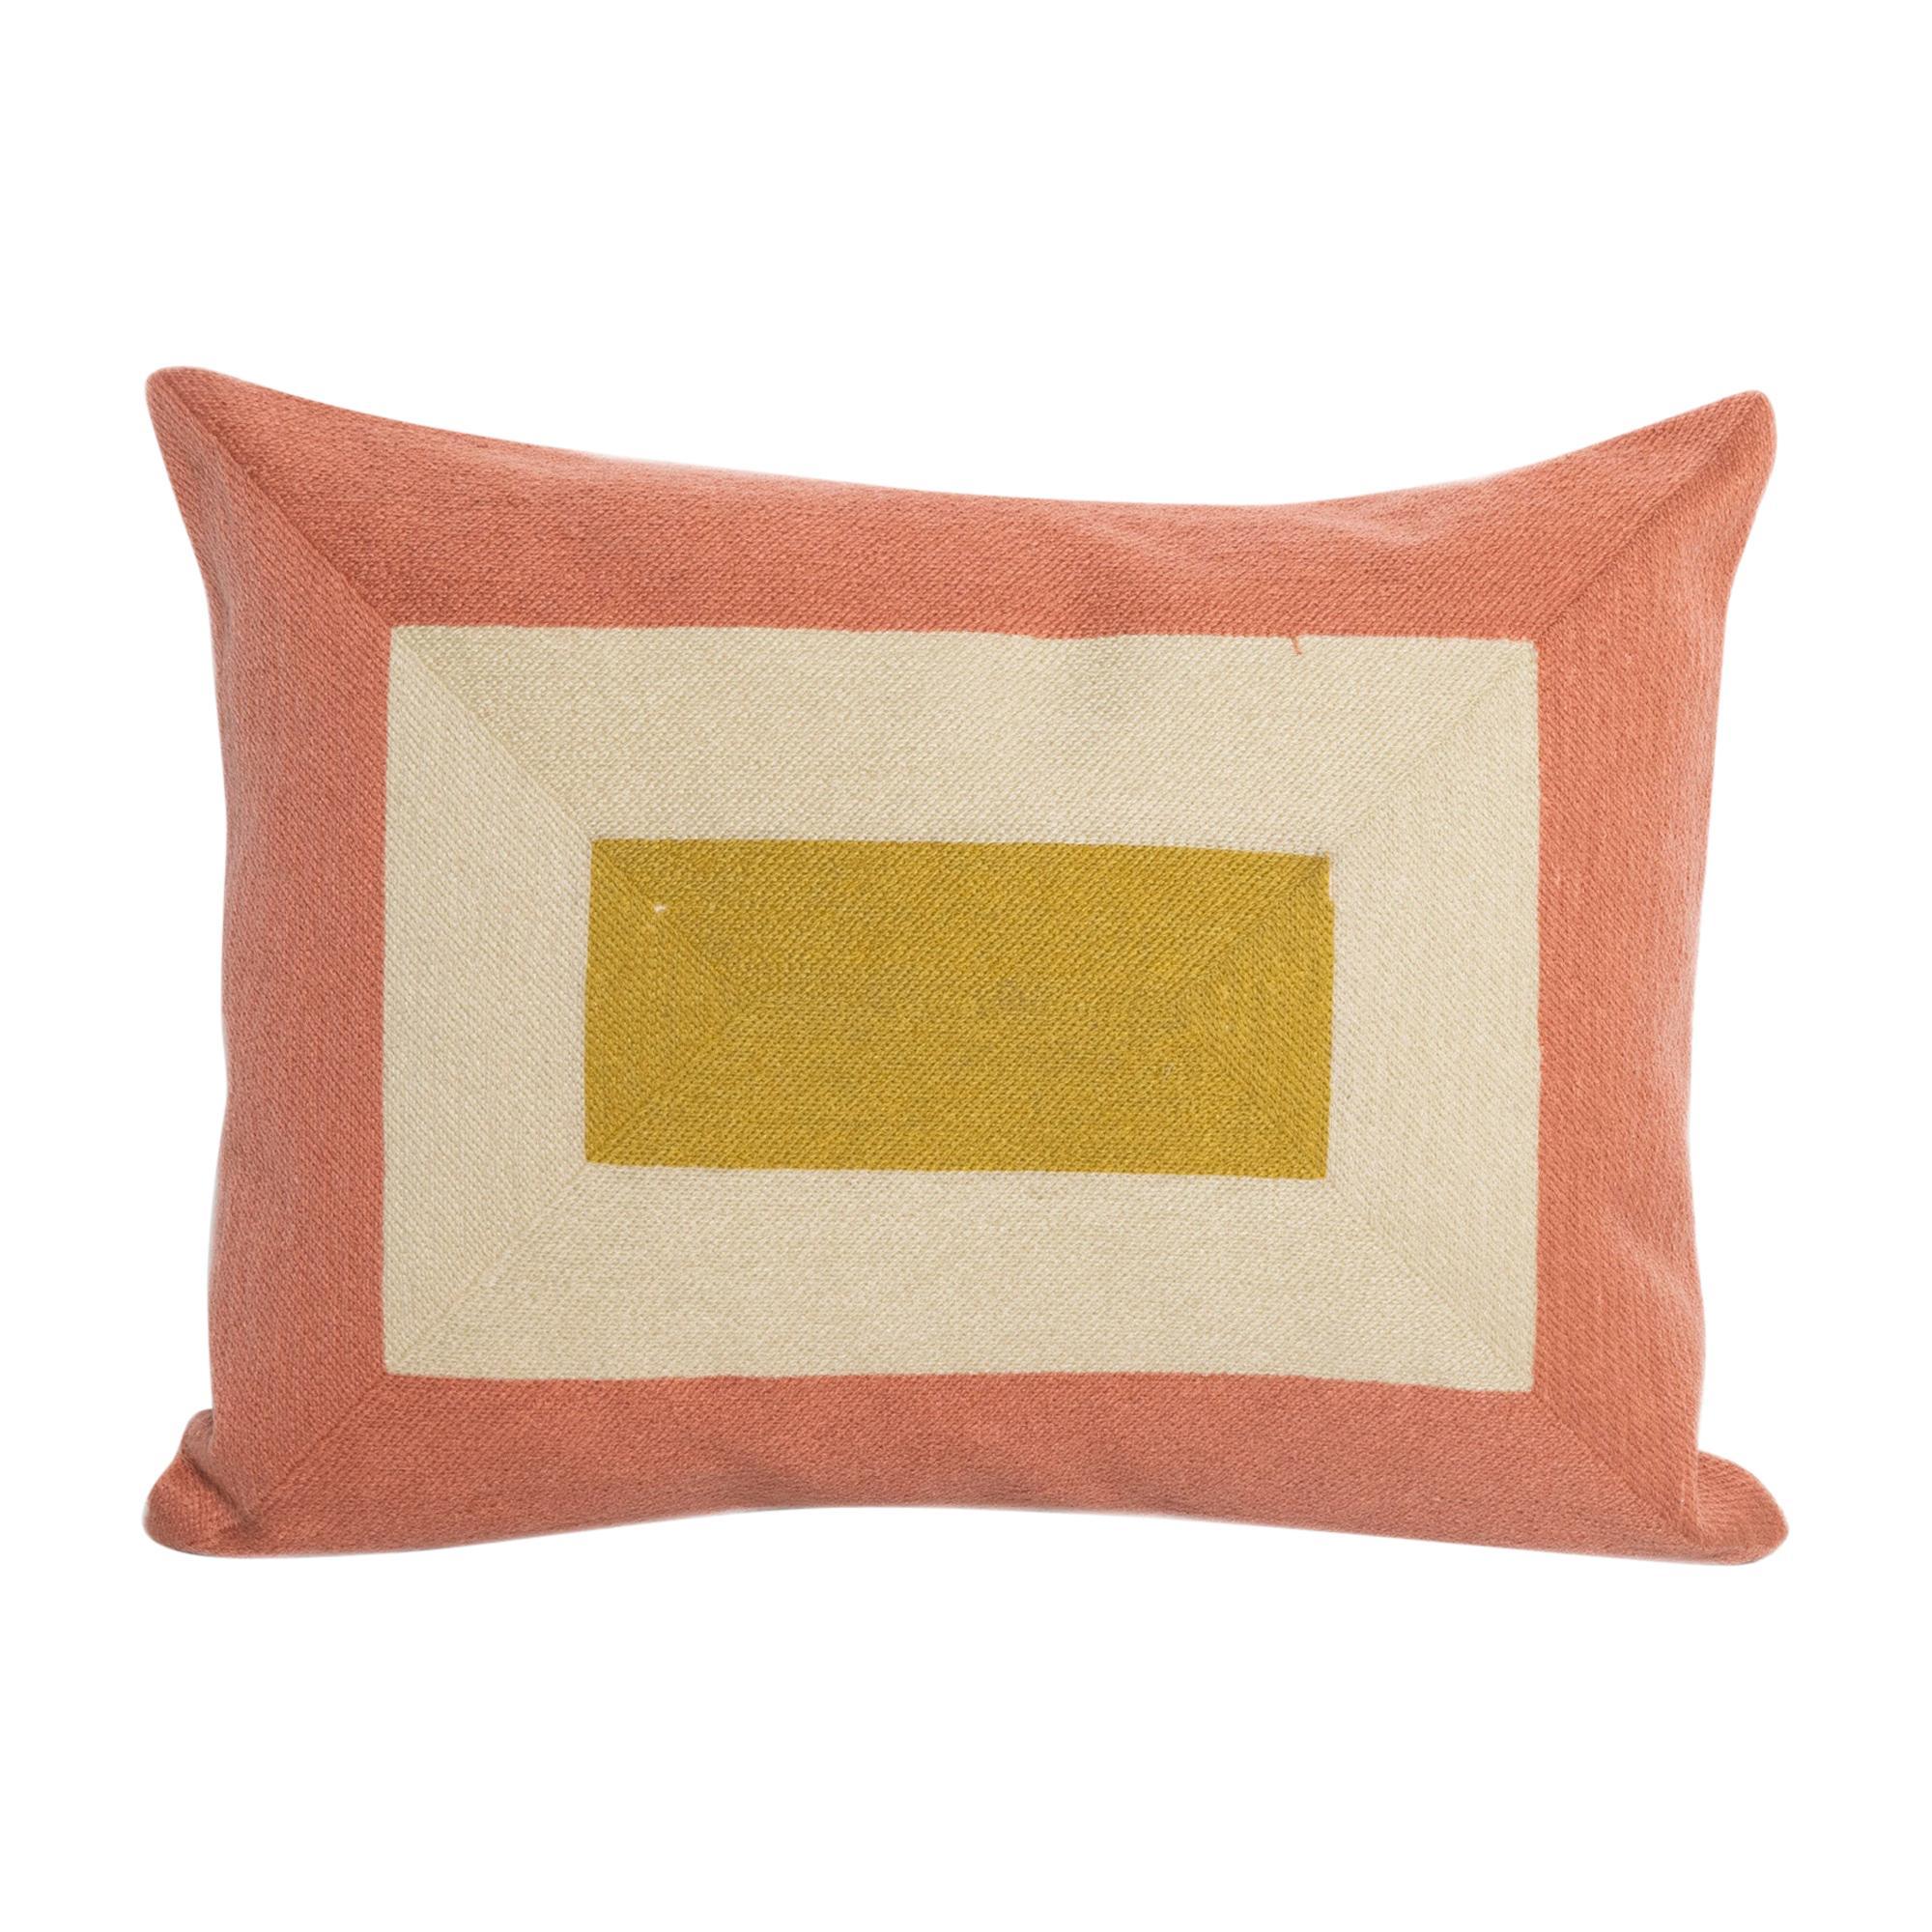 Modern Kilombo Home Embroidery Pillow Smart Salmon&Mustard